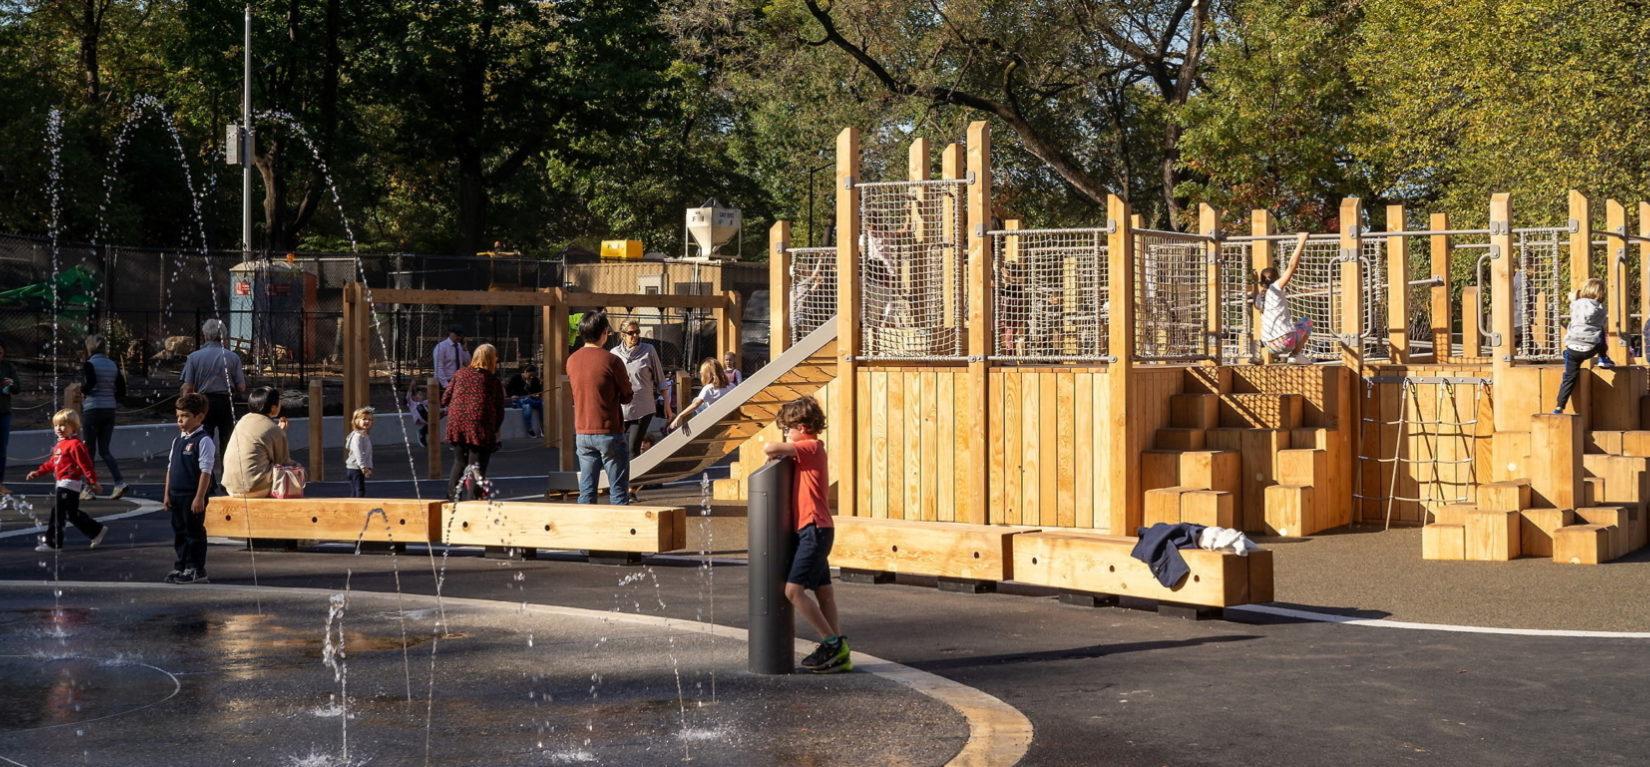 Ff wide 3x Margaret Kempner Playground